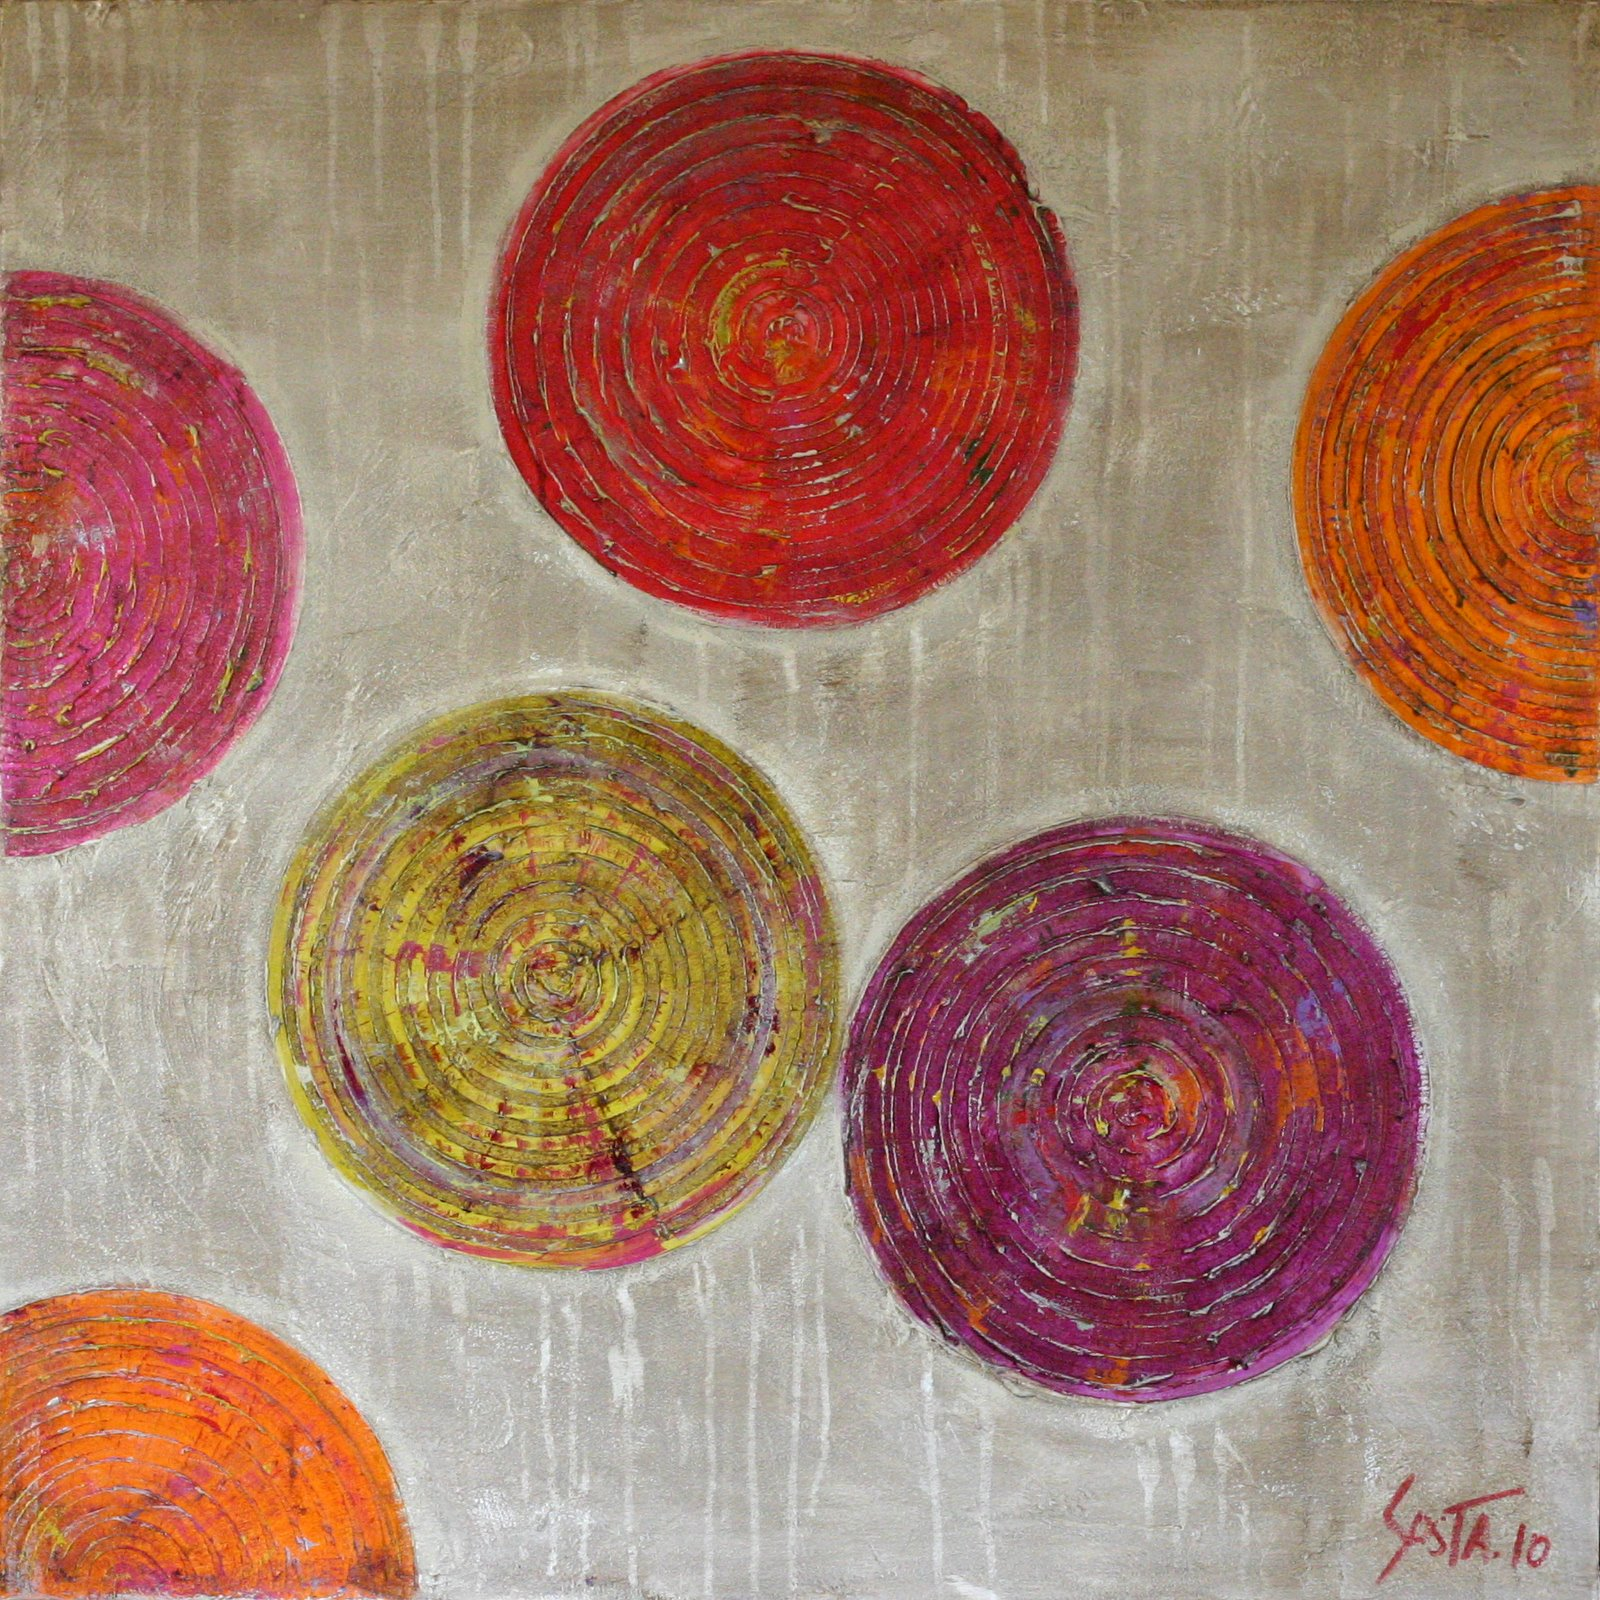 Tableau Contemporain, Microsillons 03. Sophie Costa, artiste peintre.